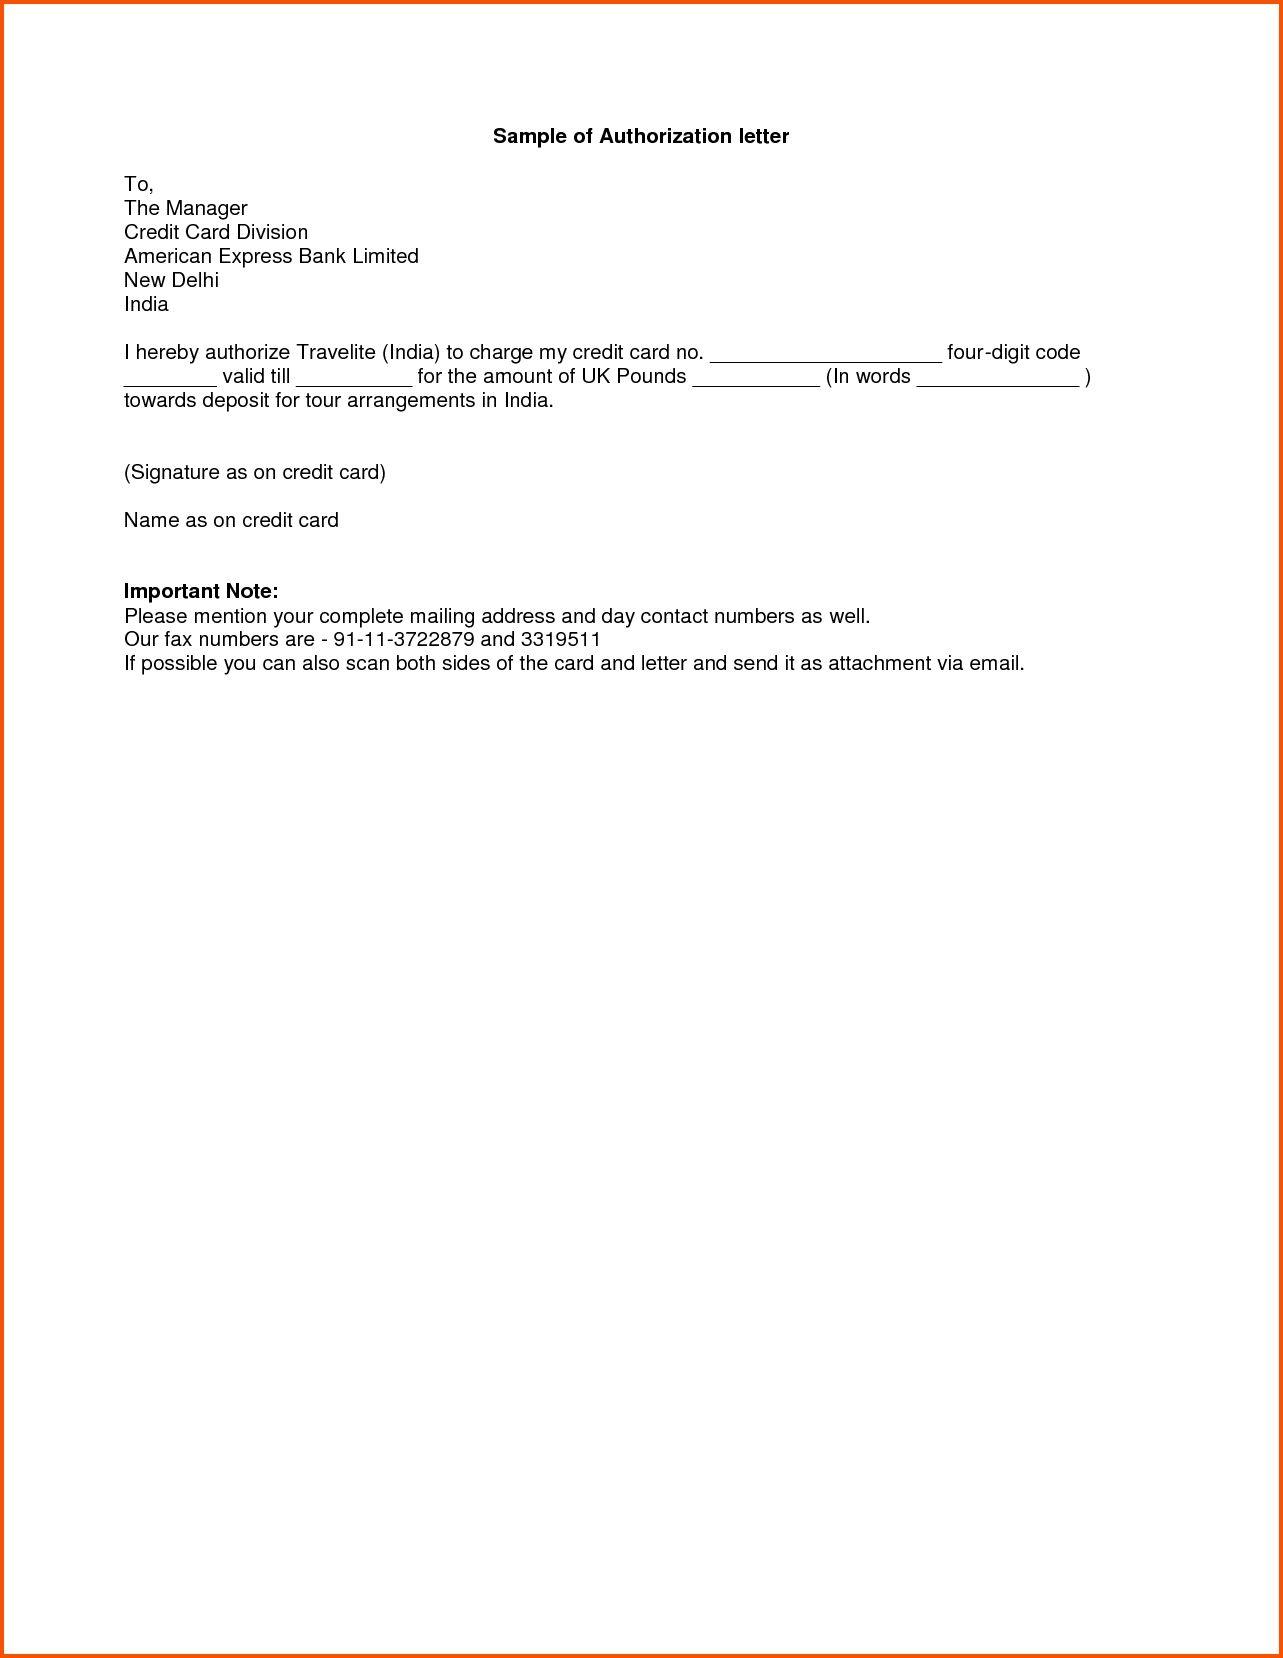 Letter authorization template survey words with download free letter authorization template survey words with download free documents pdf word madrichimfo Choice Image